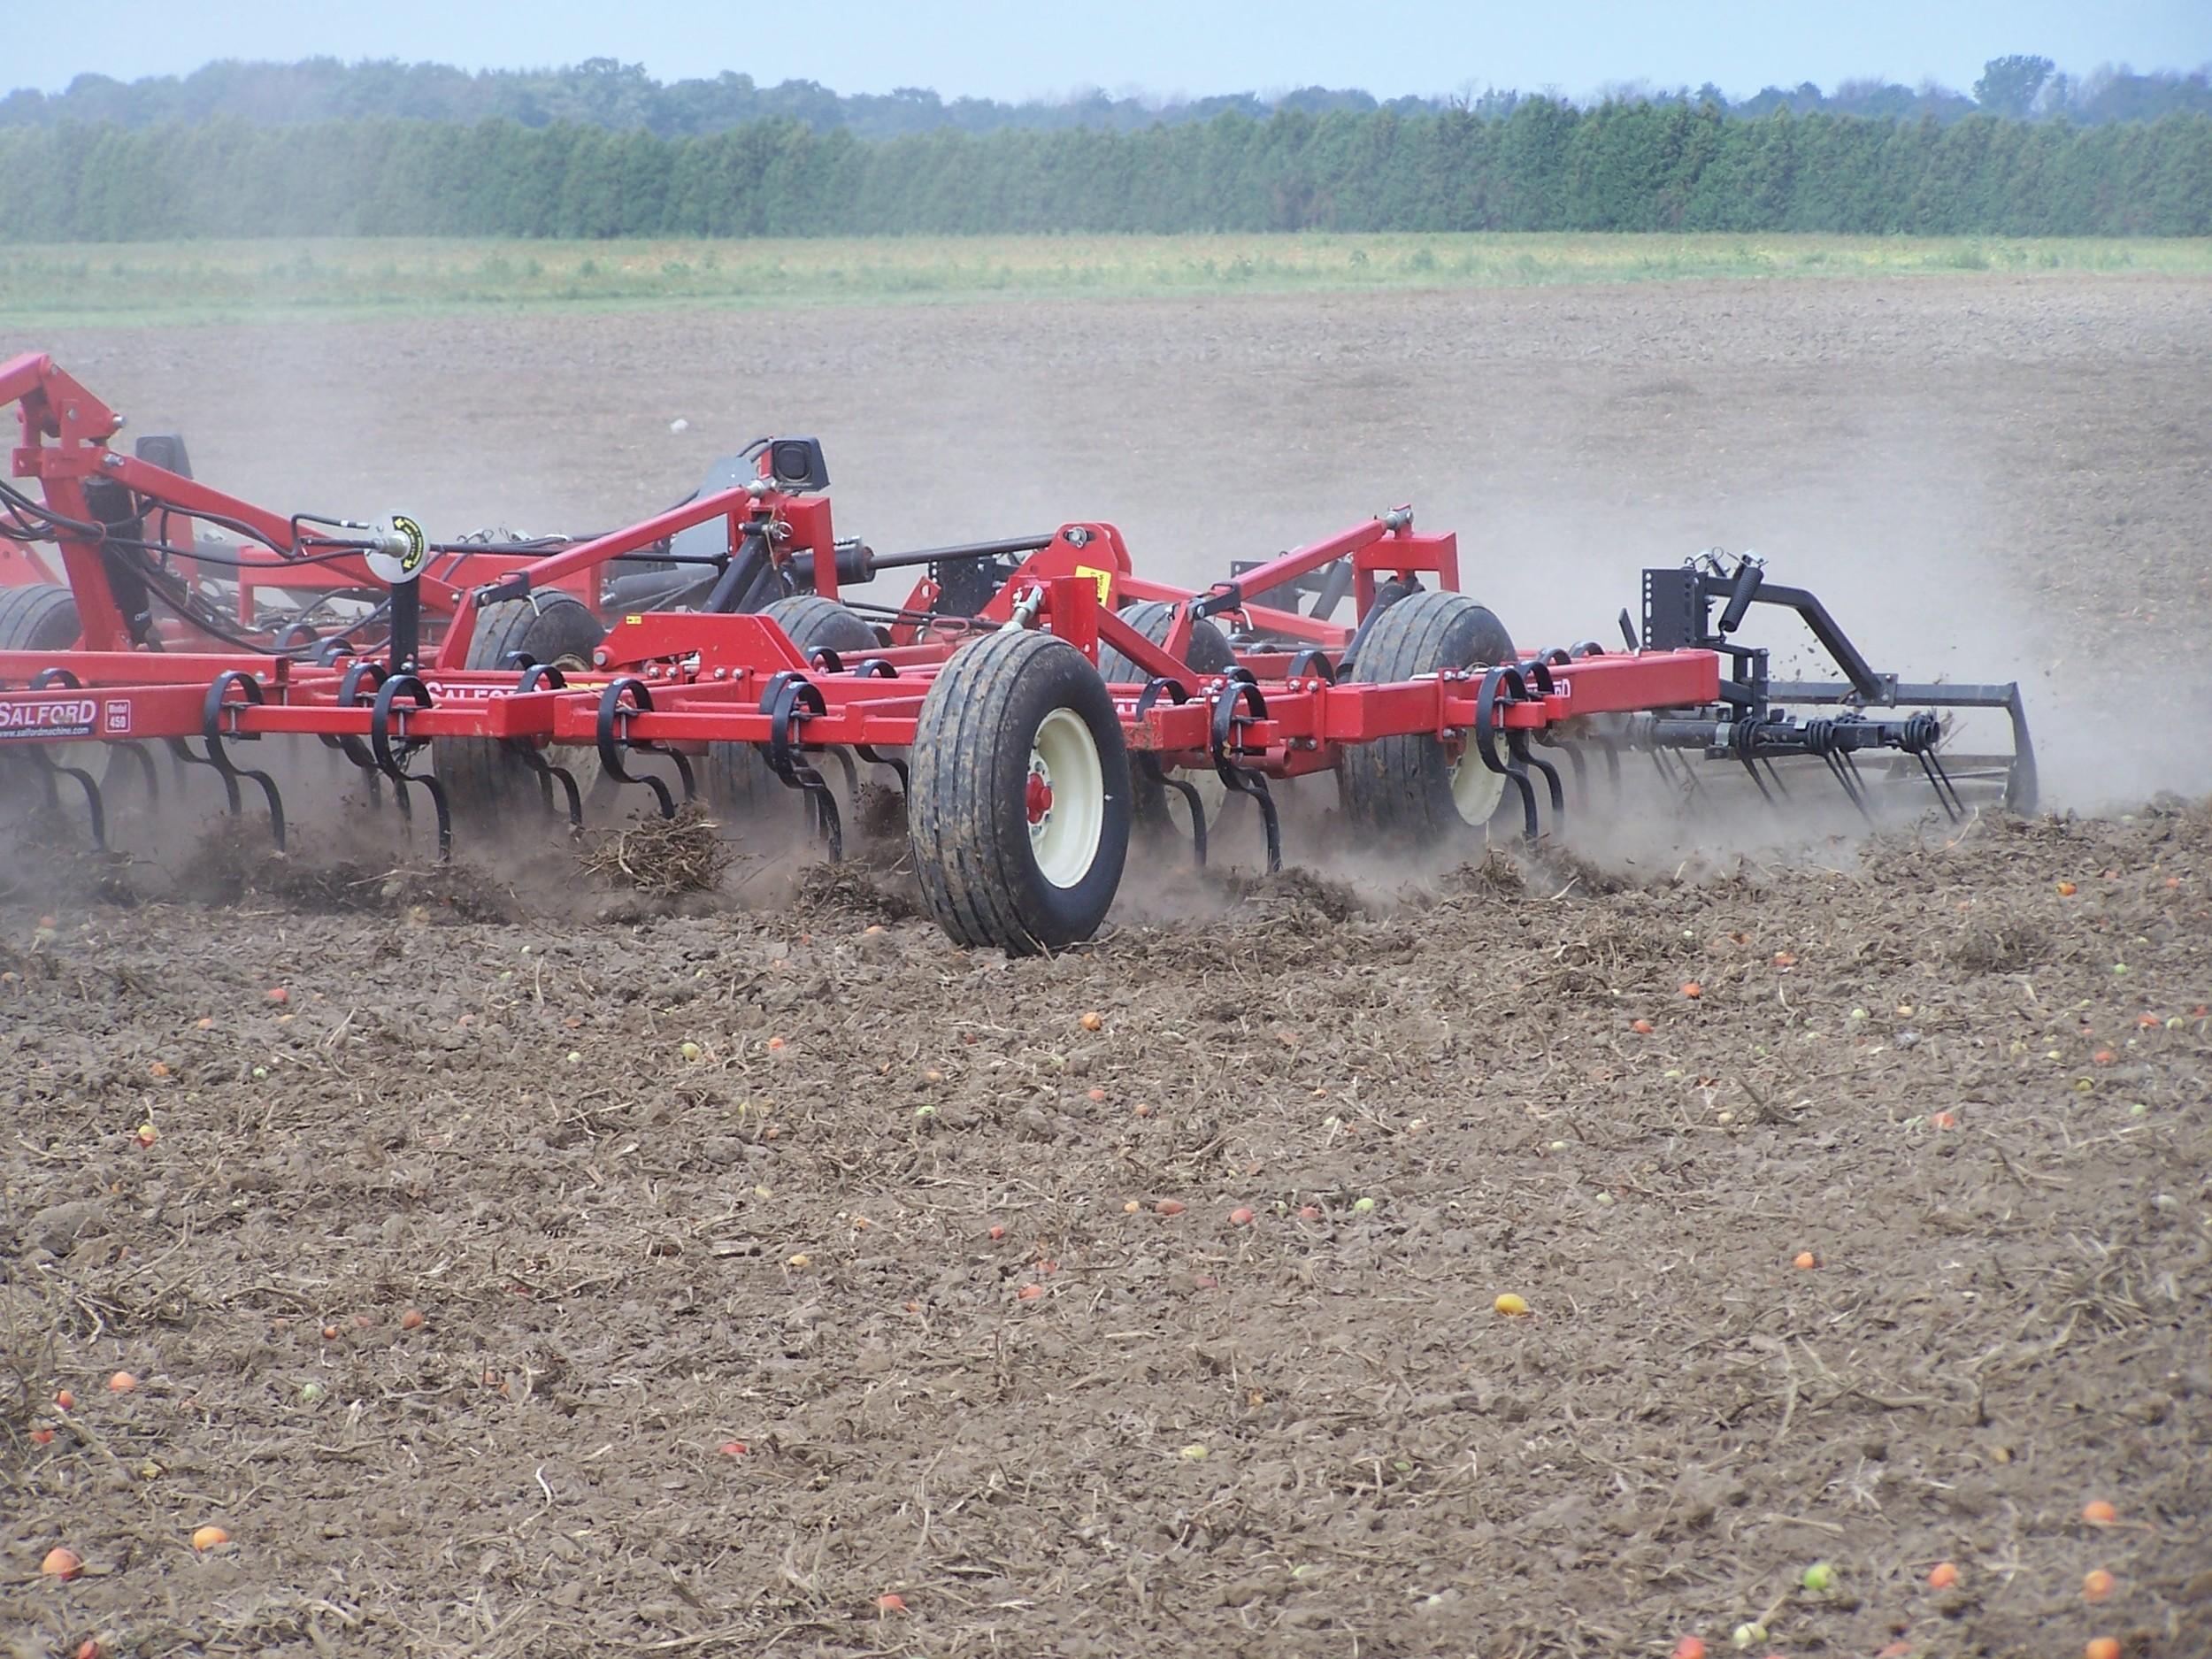 450 S-Tine C-shank Cultivators